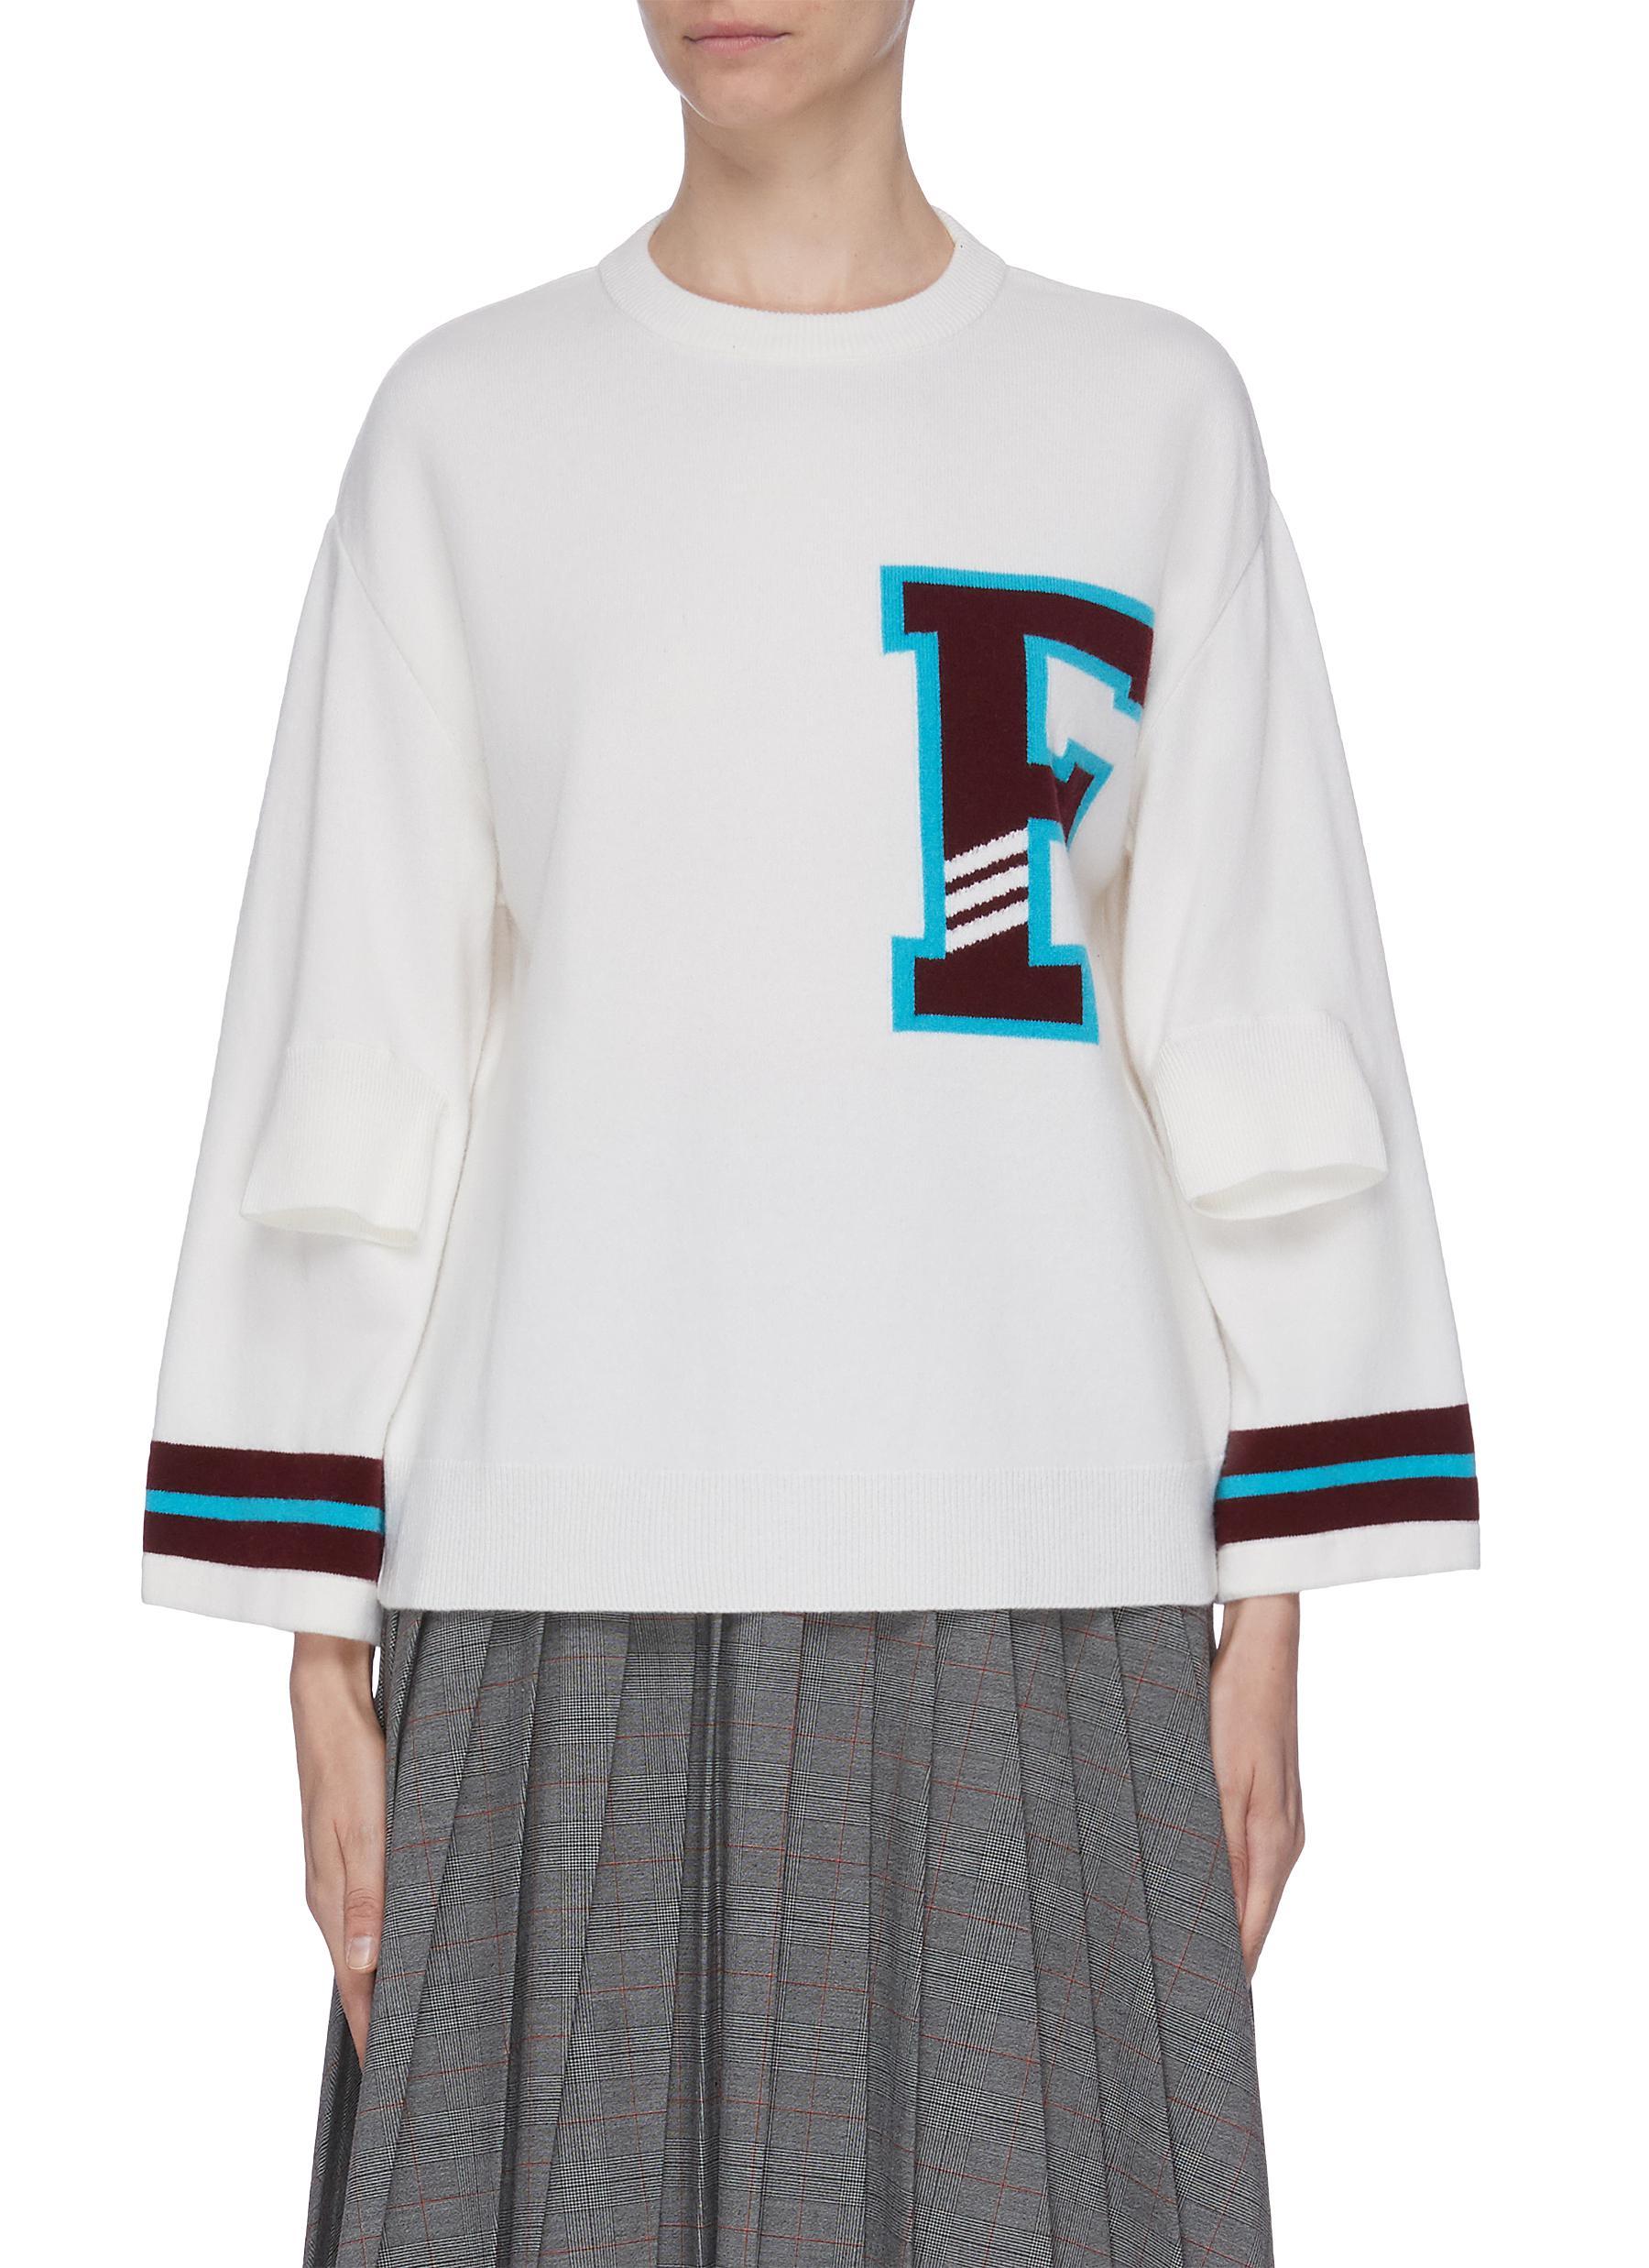 Photo of Mrz Clothing Knitwear online sale